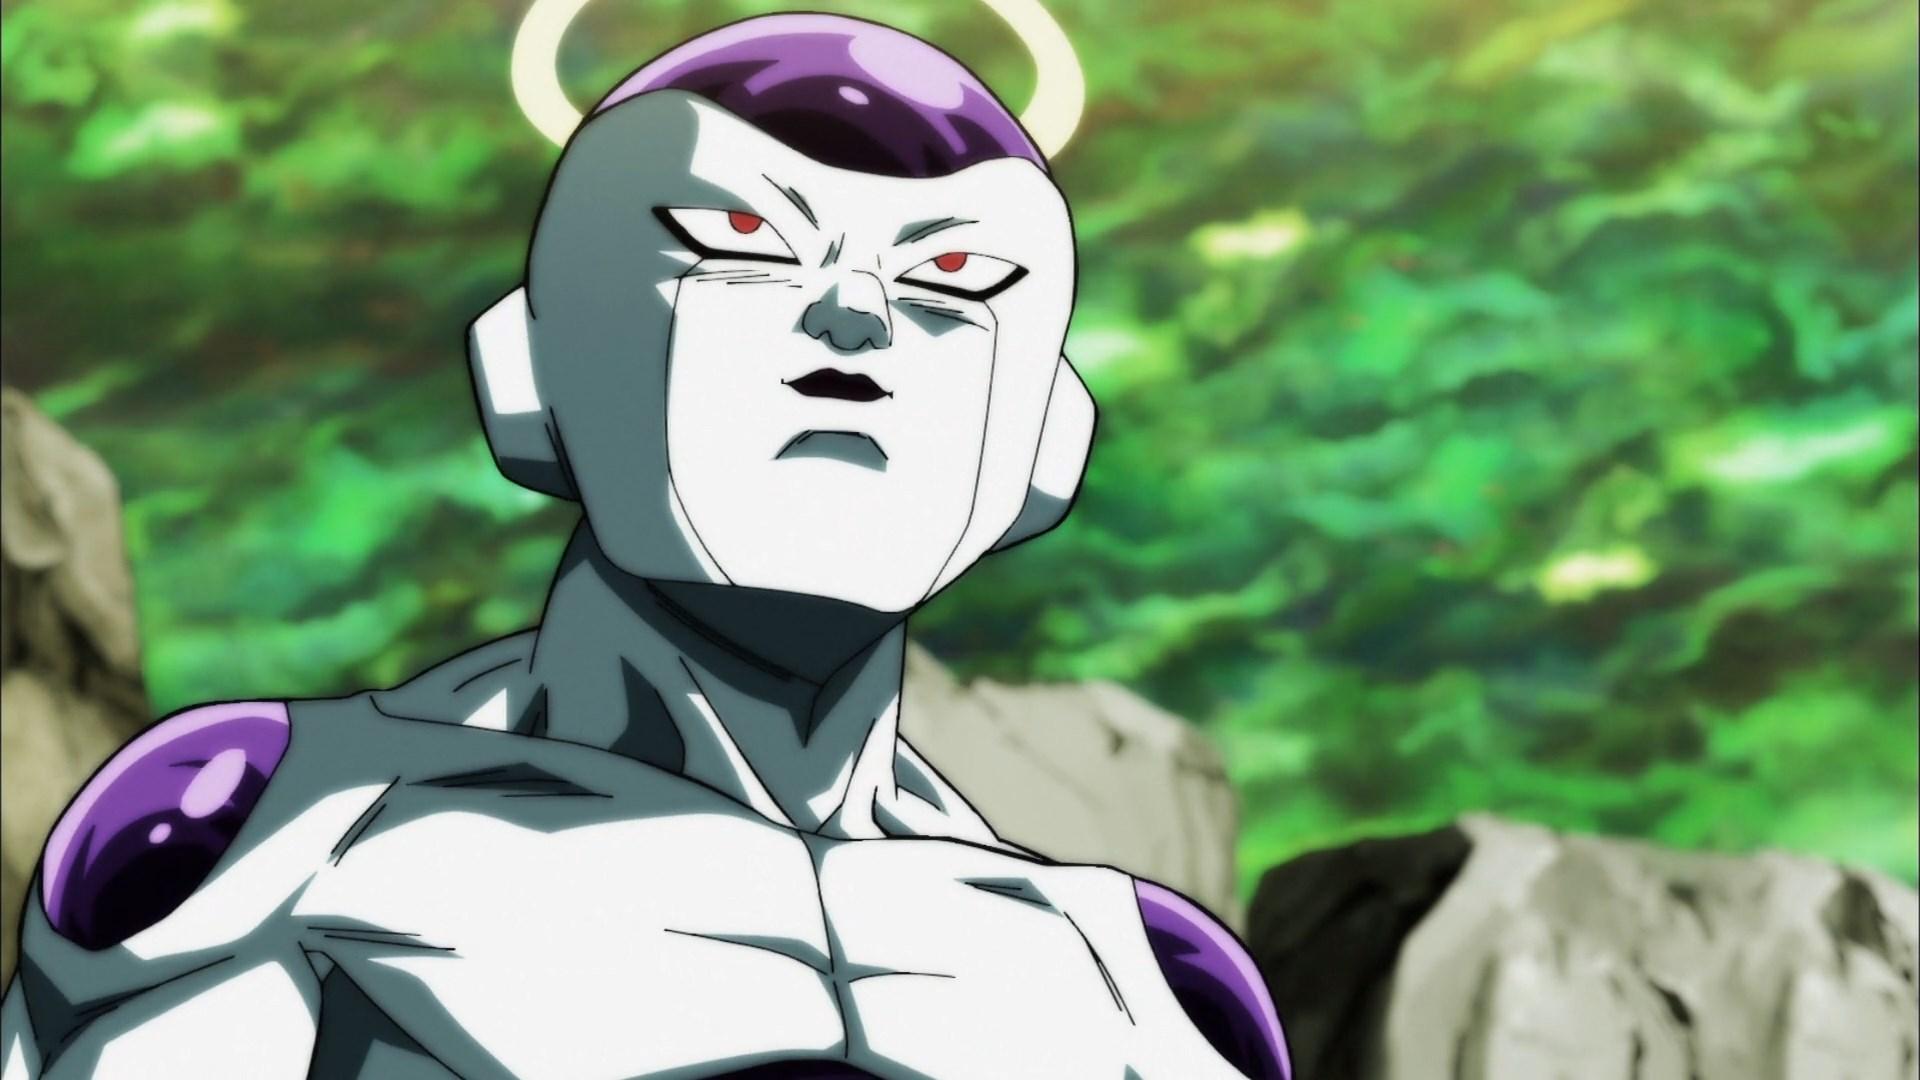 [HorribleSubs] Dragon Ball Super - 121 [1080p].mkv_snapshot_21.16